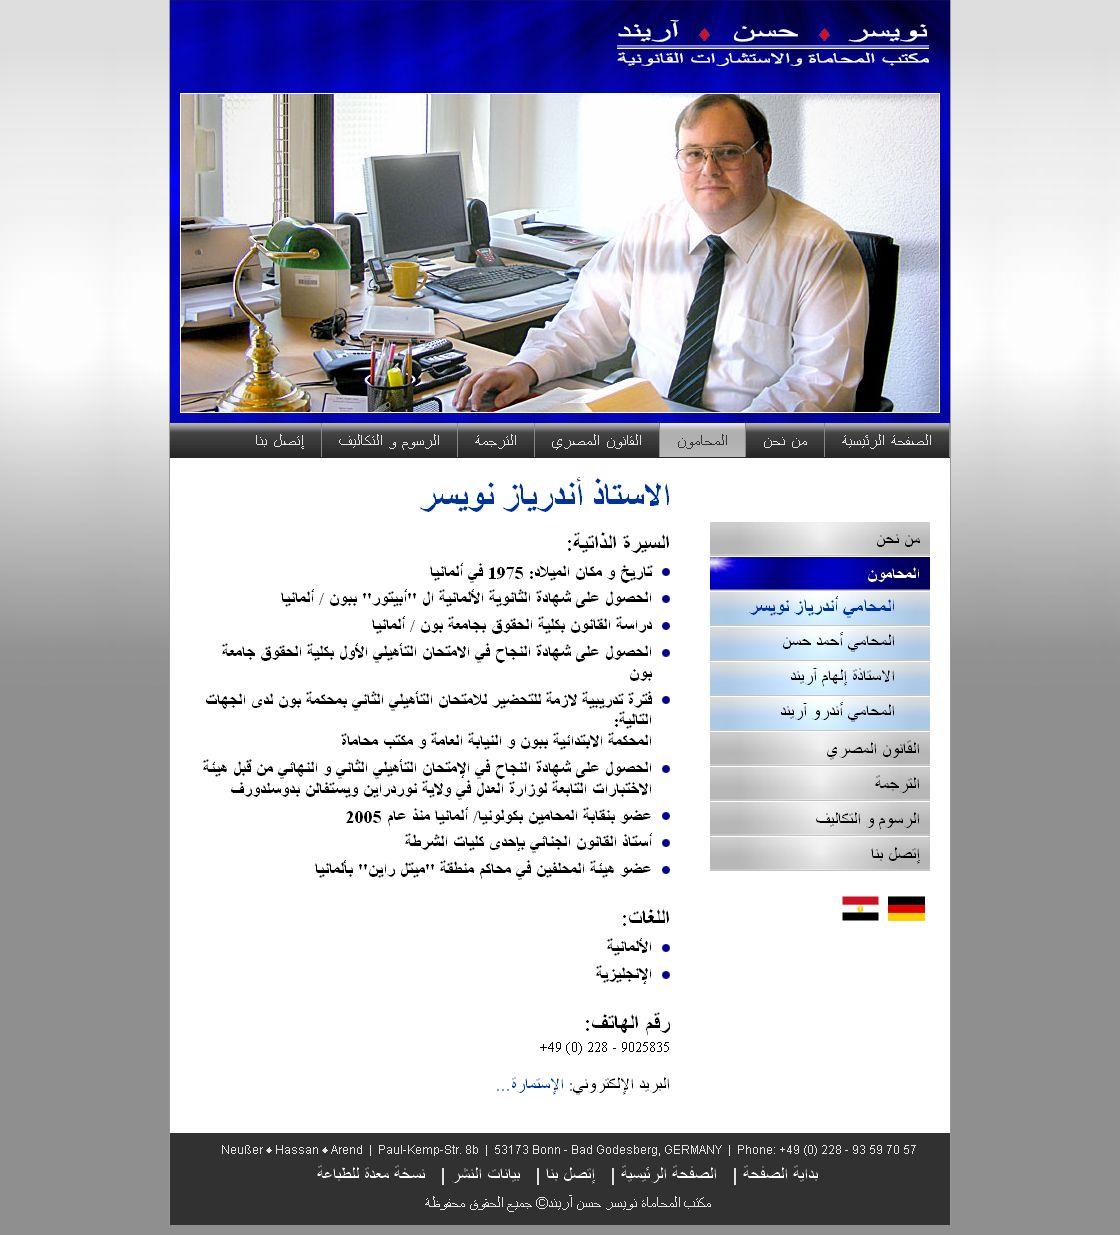 www_nha-kanzlei_de_demo_1